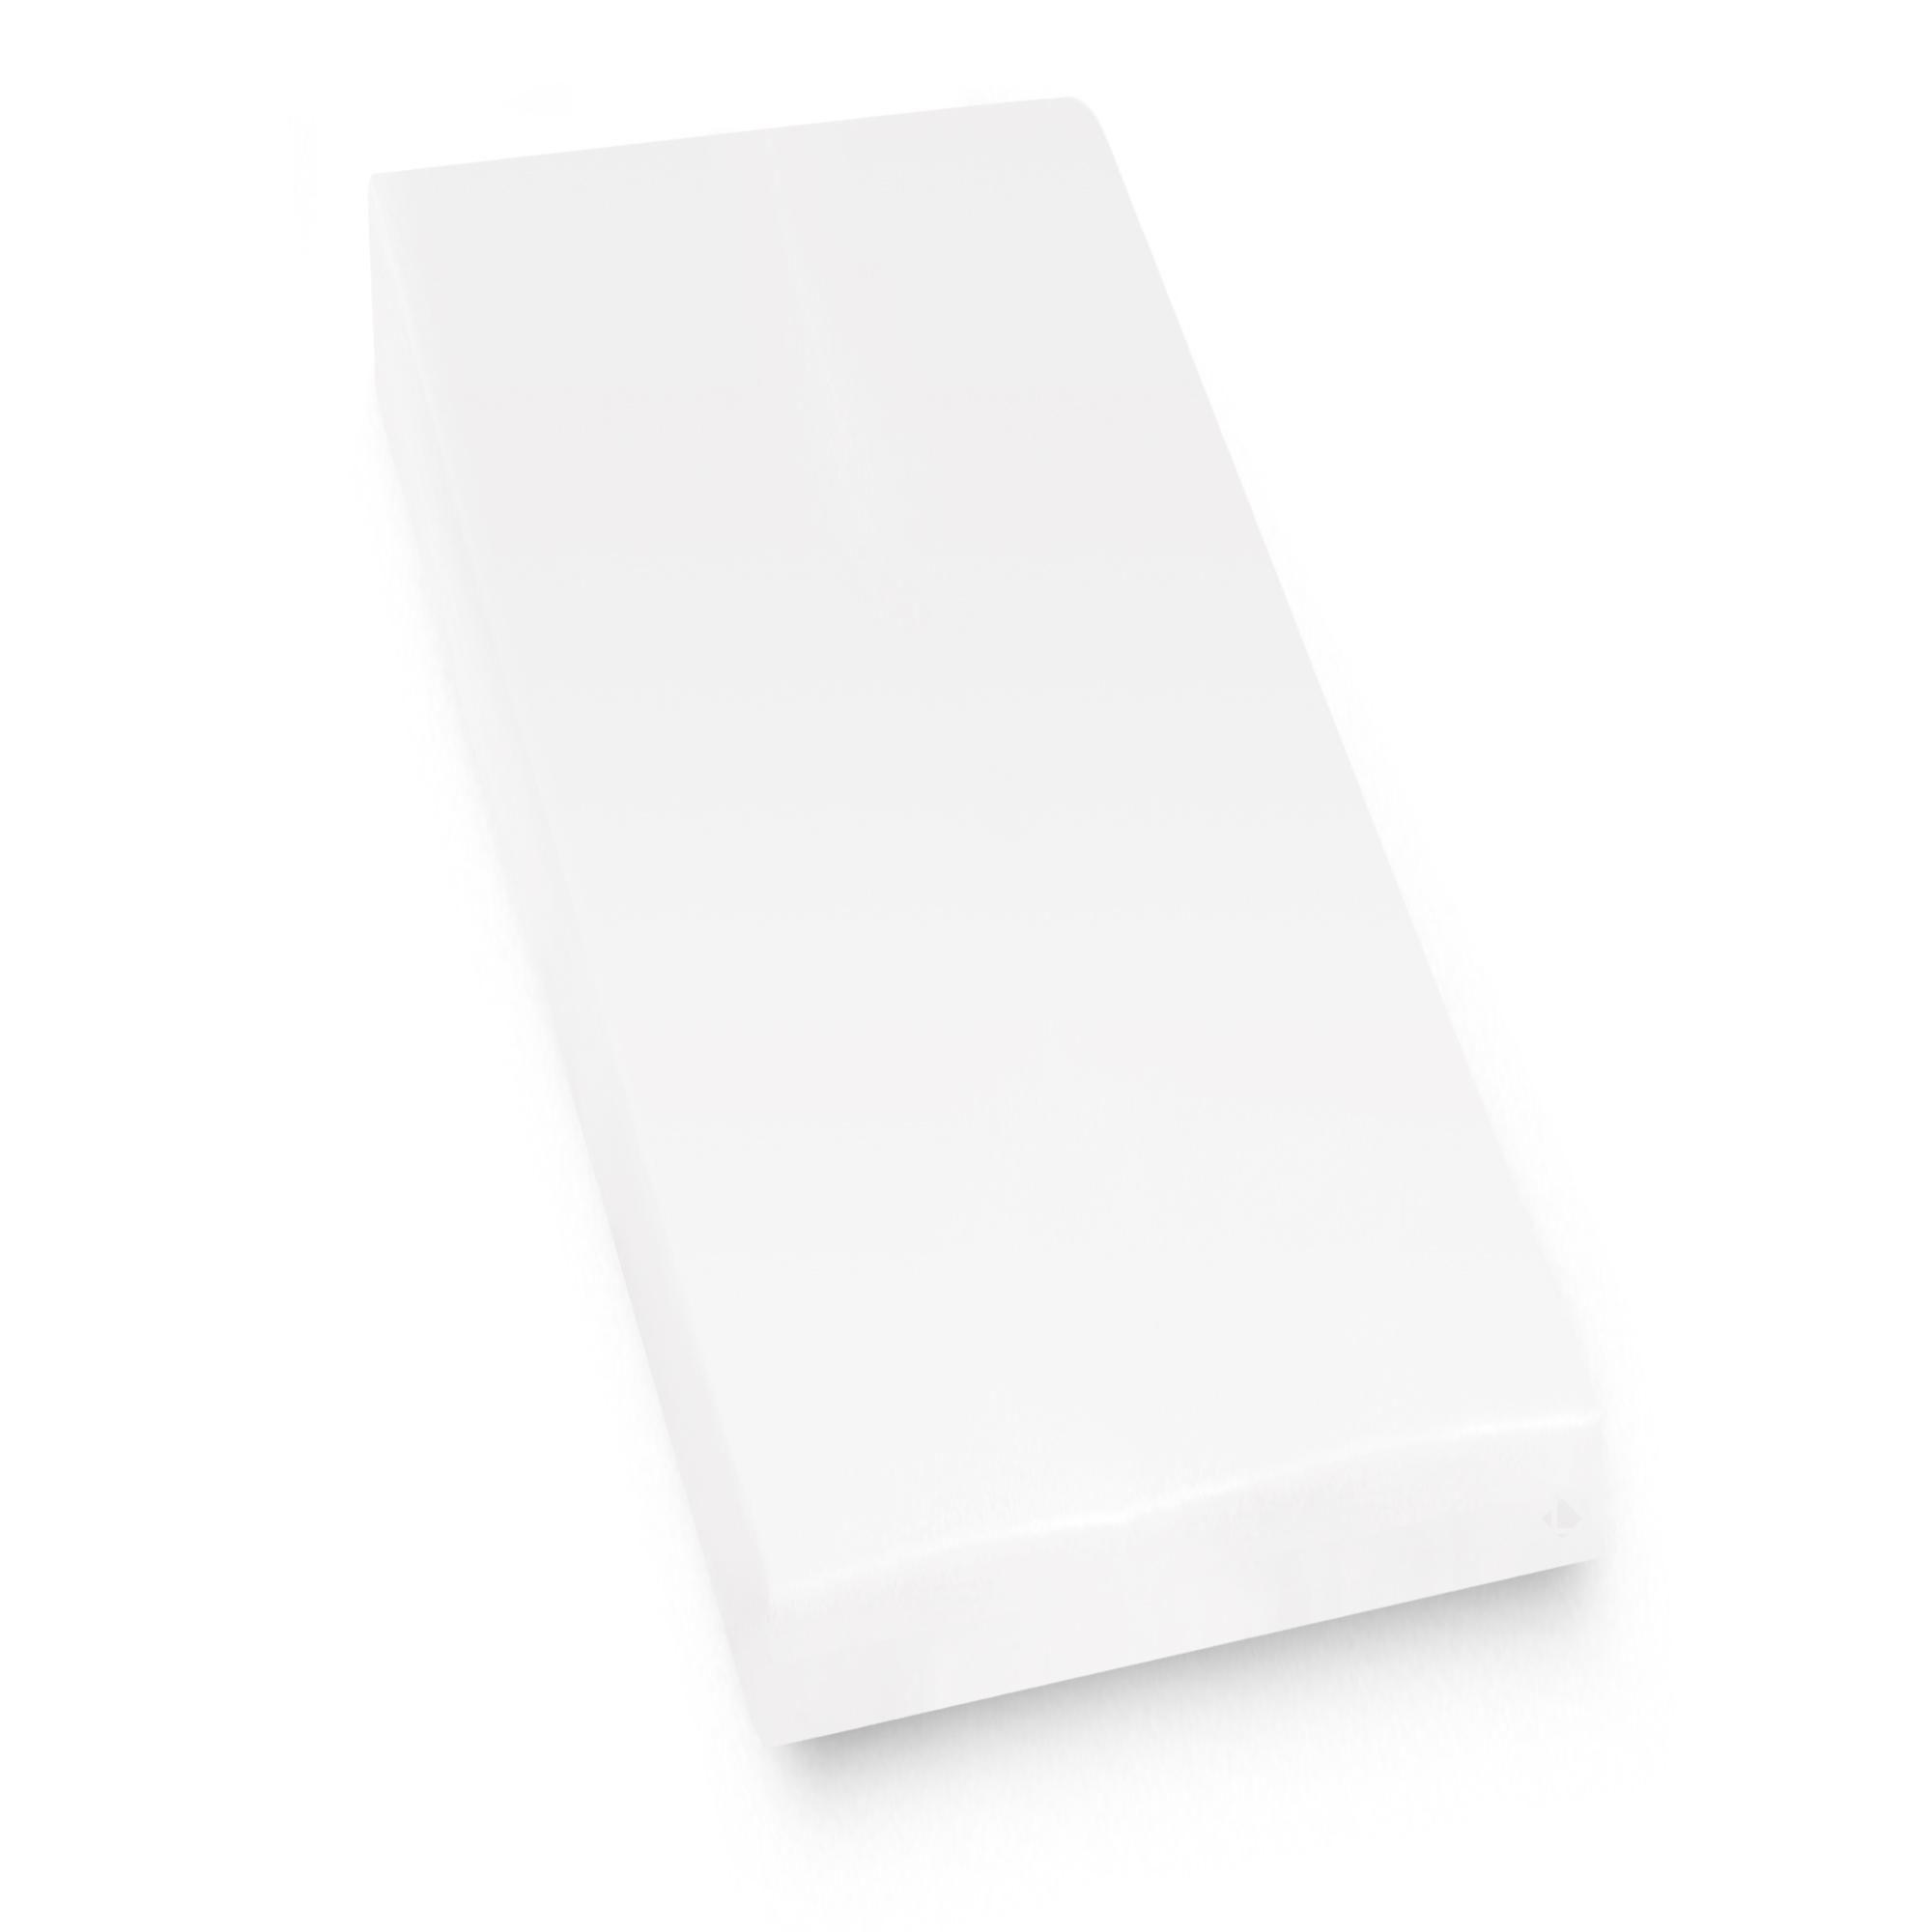 PROTÈGE MATELAS  Protège matelas imperméable 80x190 cm ARNAUD - ...